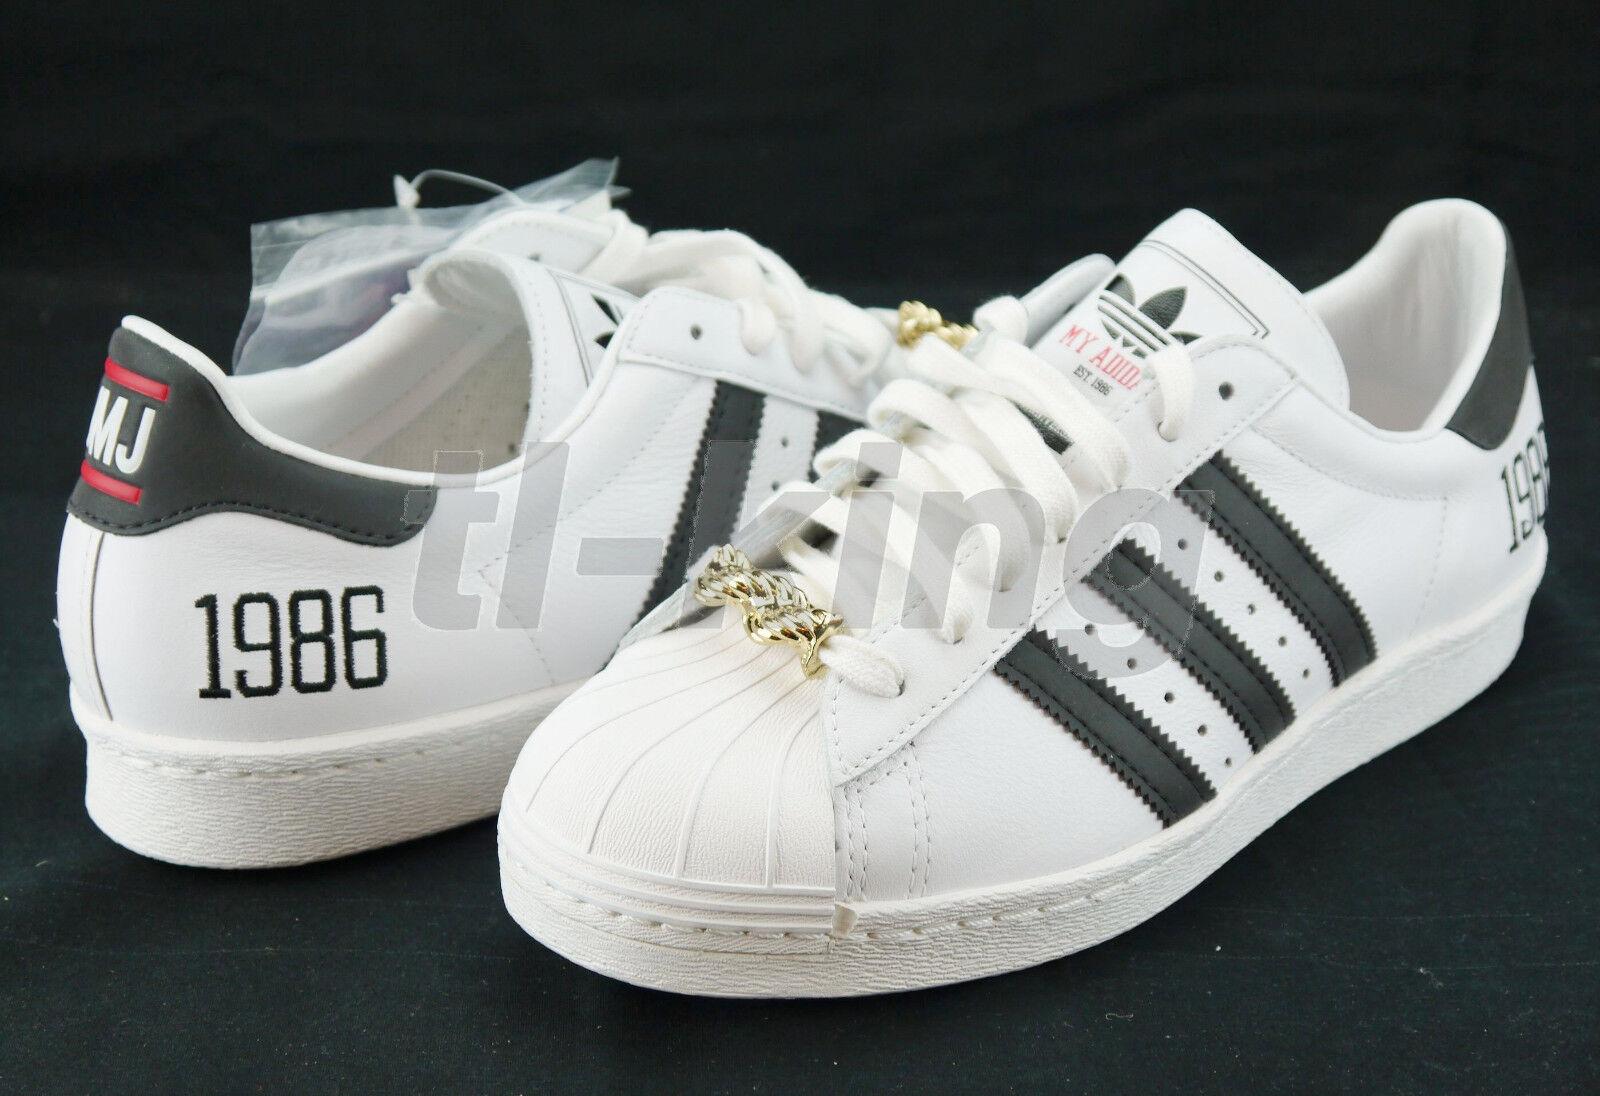 new style 7ada3 aa9ab Adidas Originals Superstar 80s 1986 My Adidas RUN DMC 25th Anniversary sz 8  new